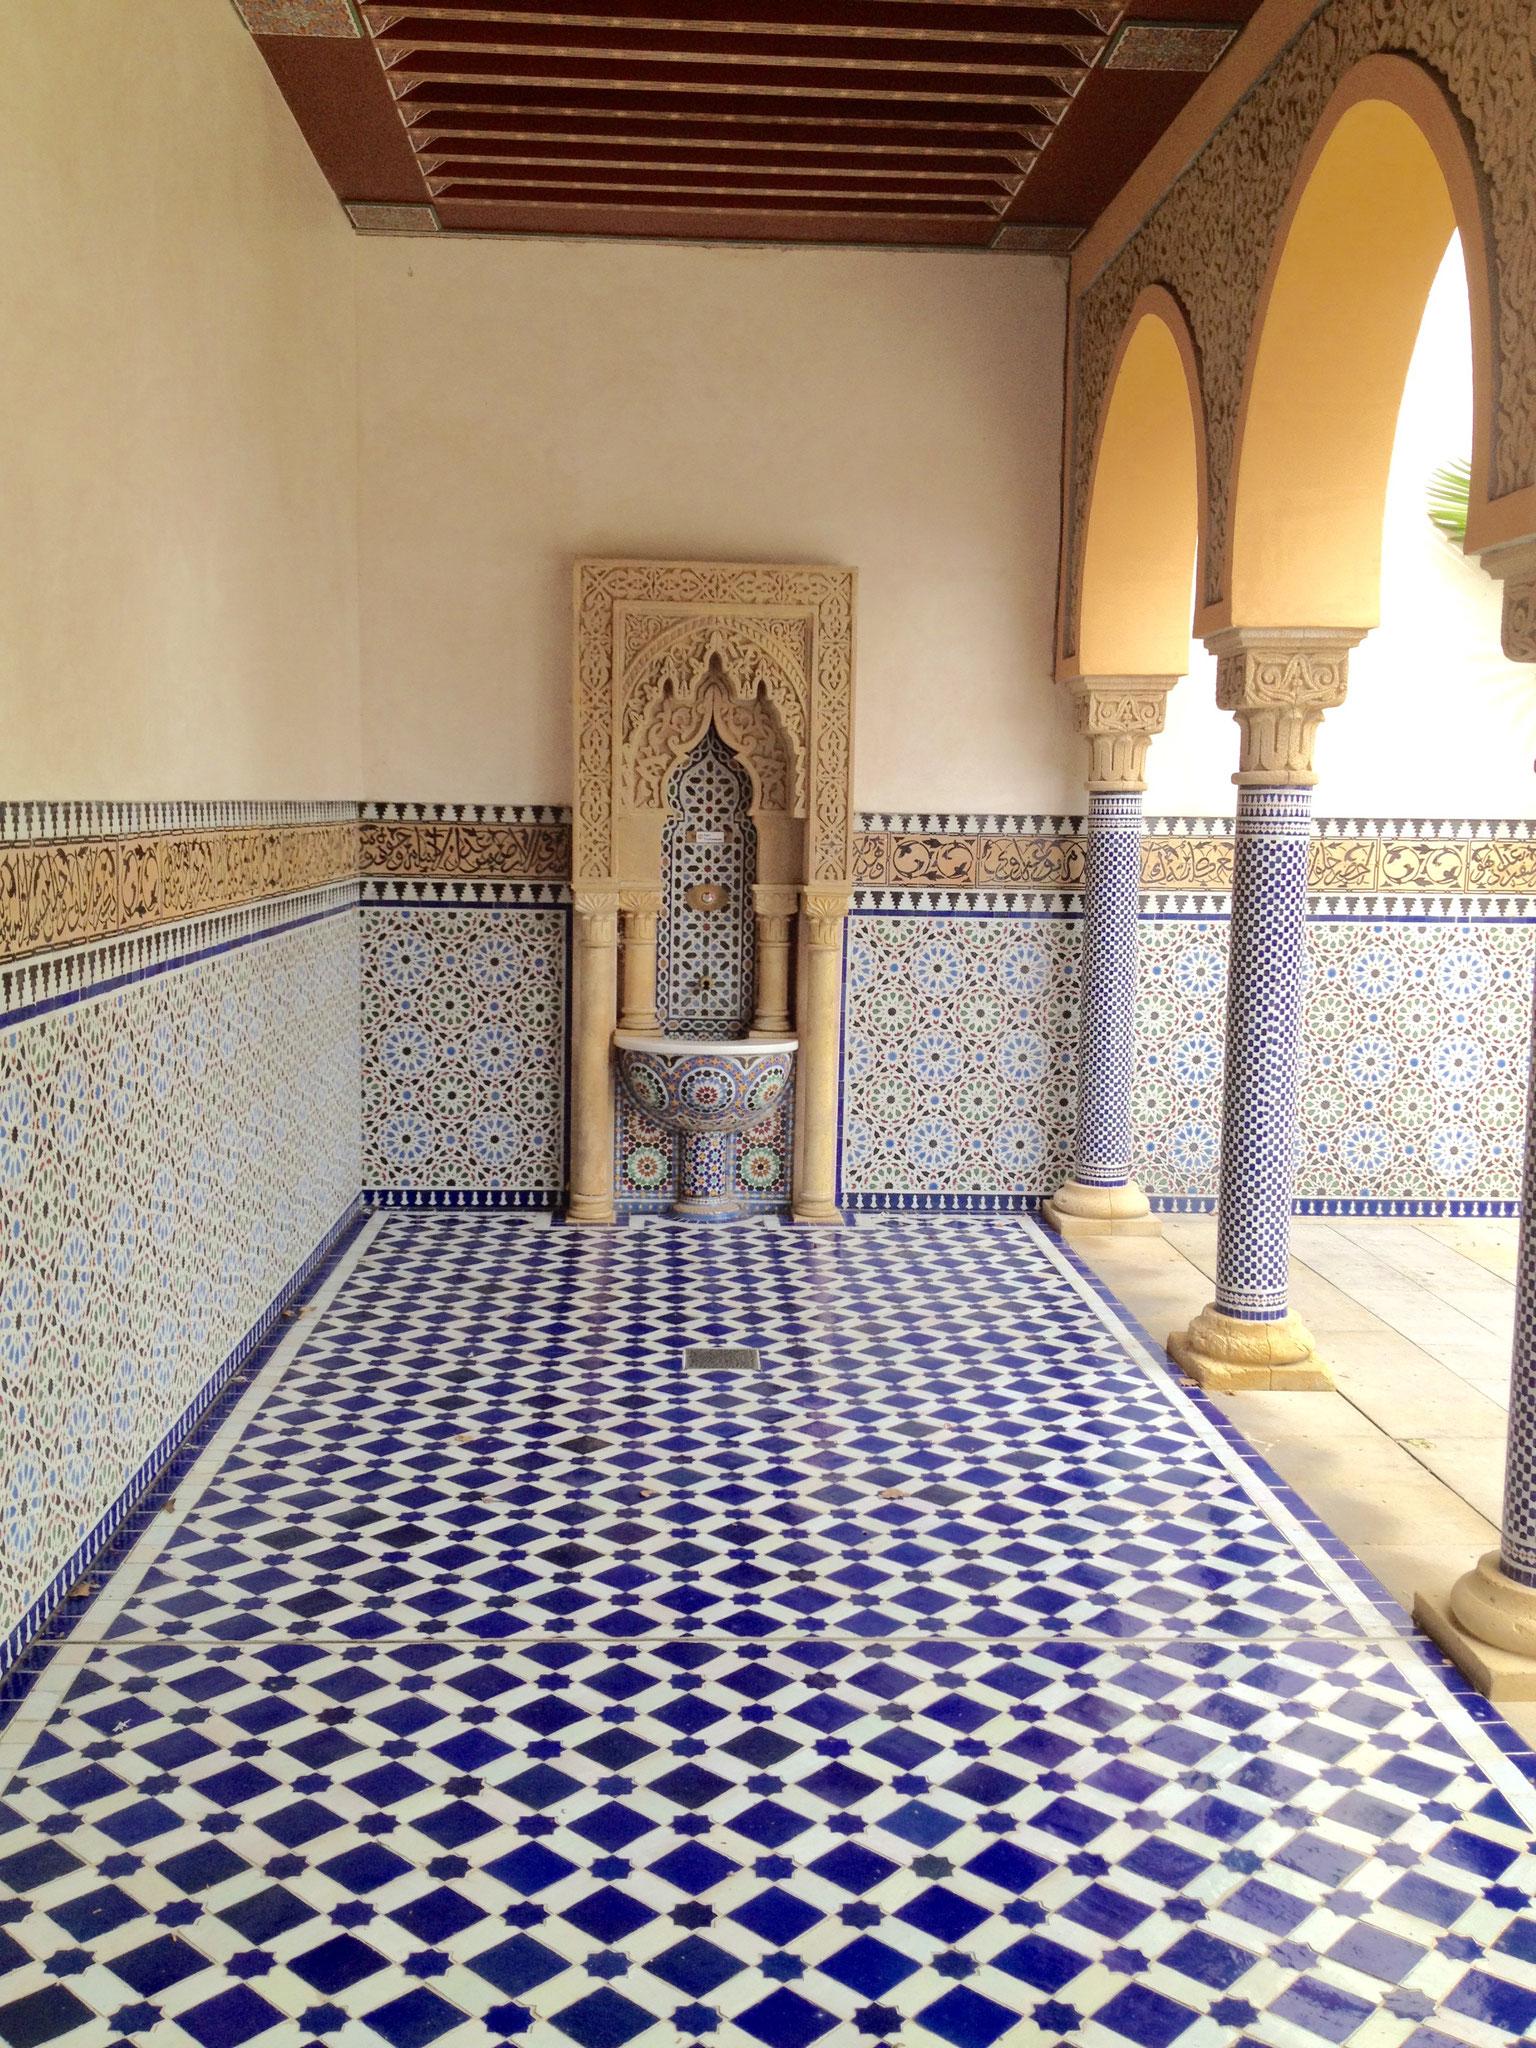 Feinste Fliesenlegekunst im orientalischer Garten